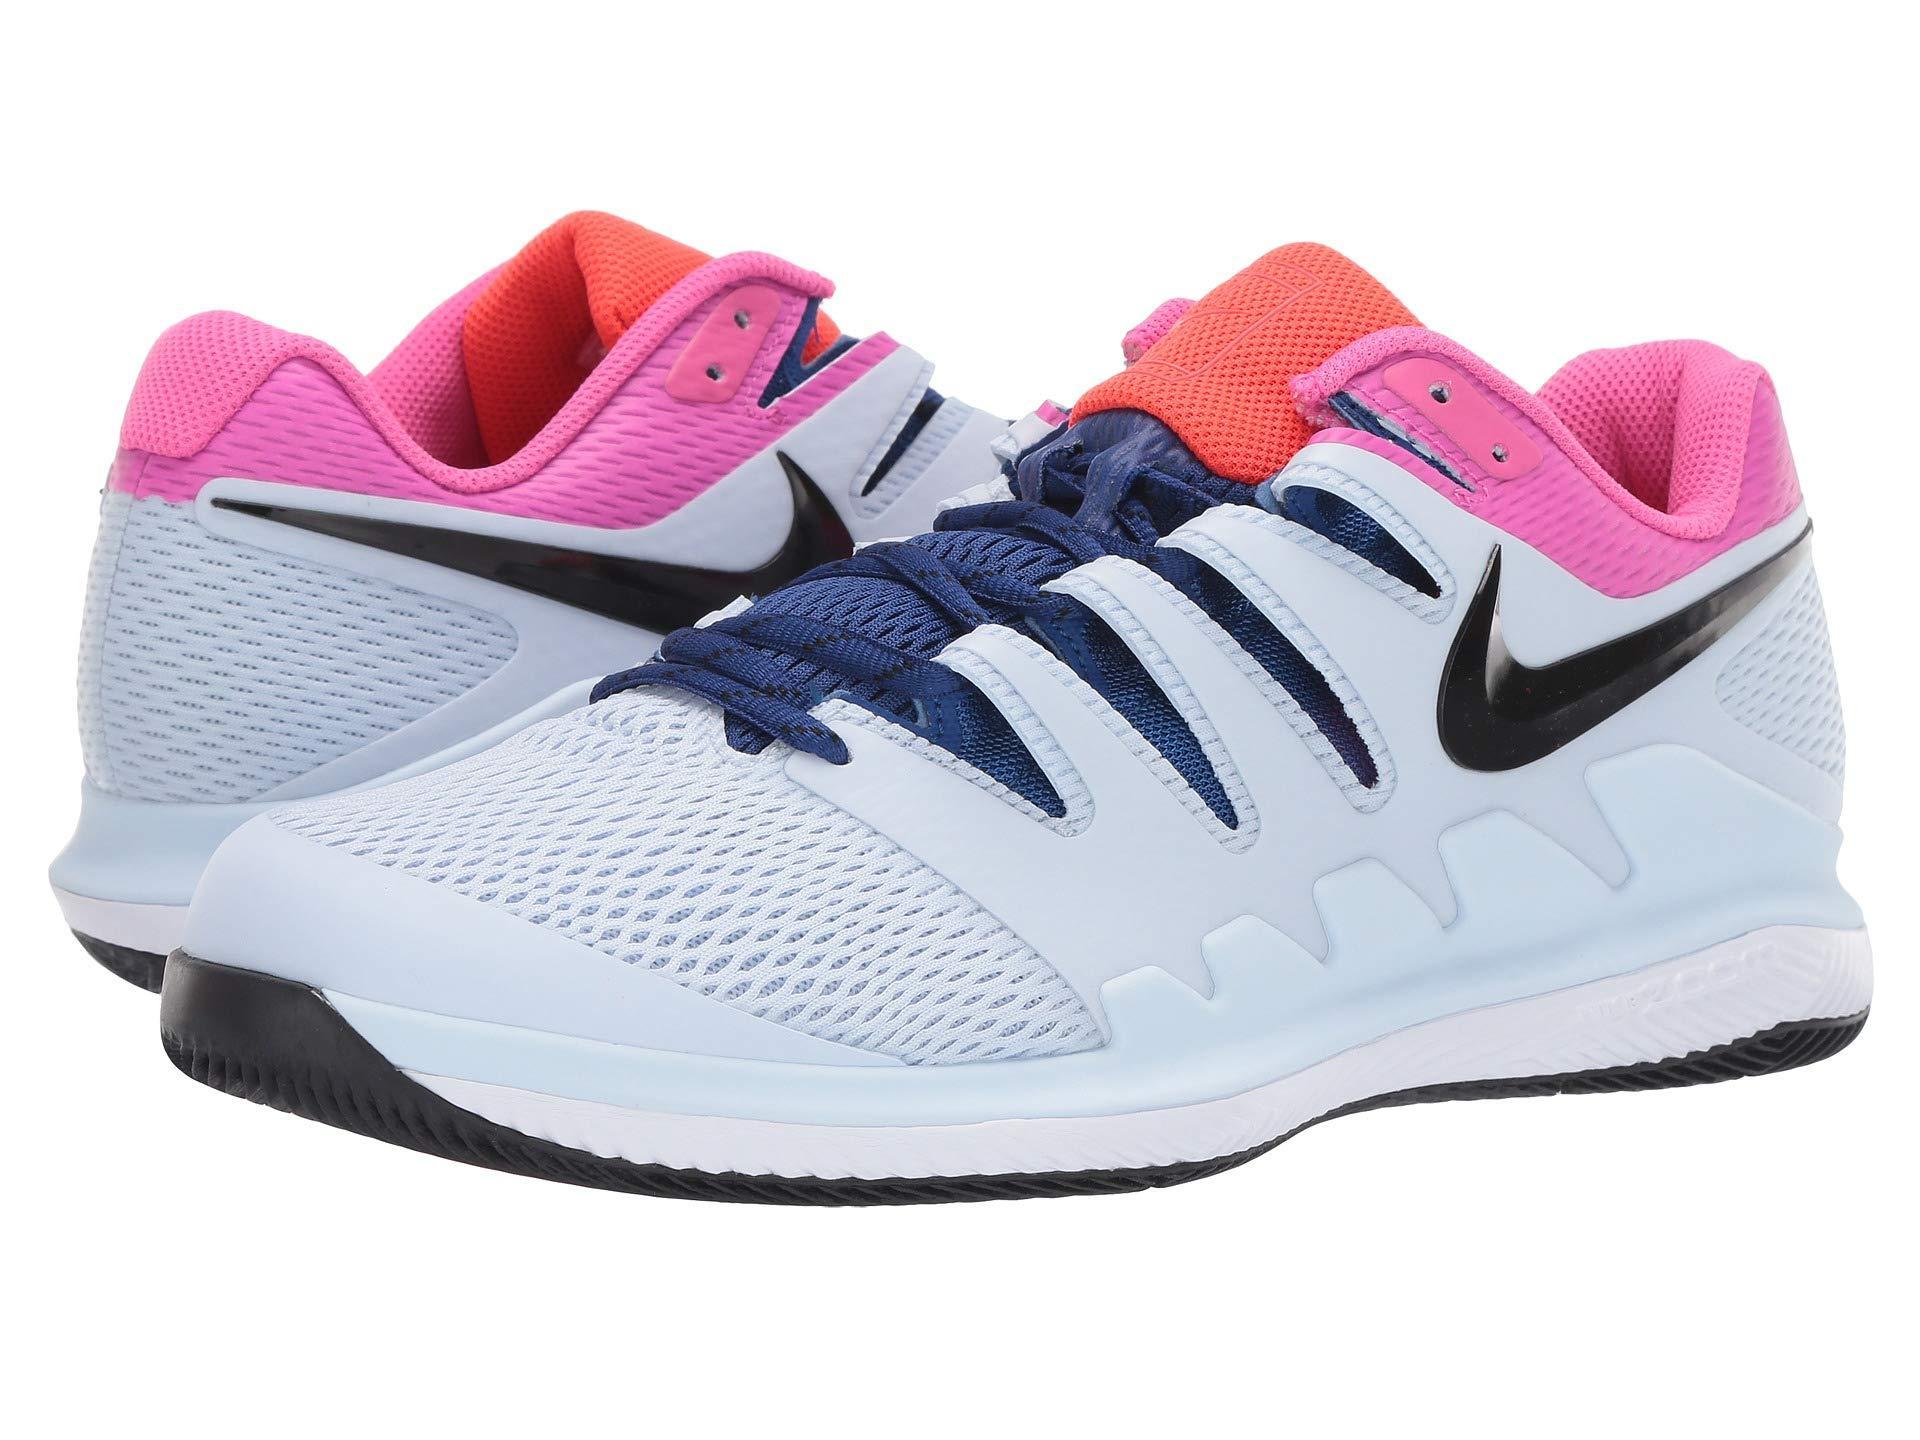 2898aa179b1e Nike. Air Zoom Vapor X (black white bright Crimson) Men s Tennis Shoes